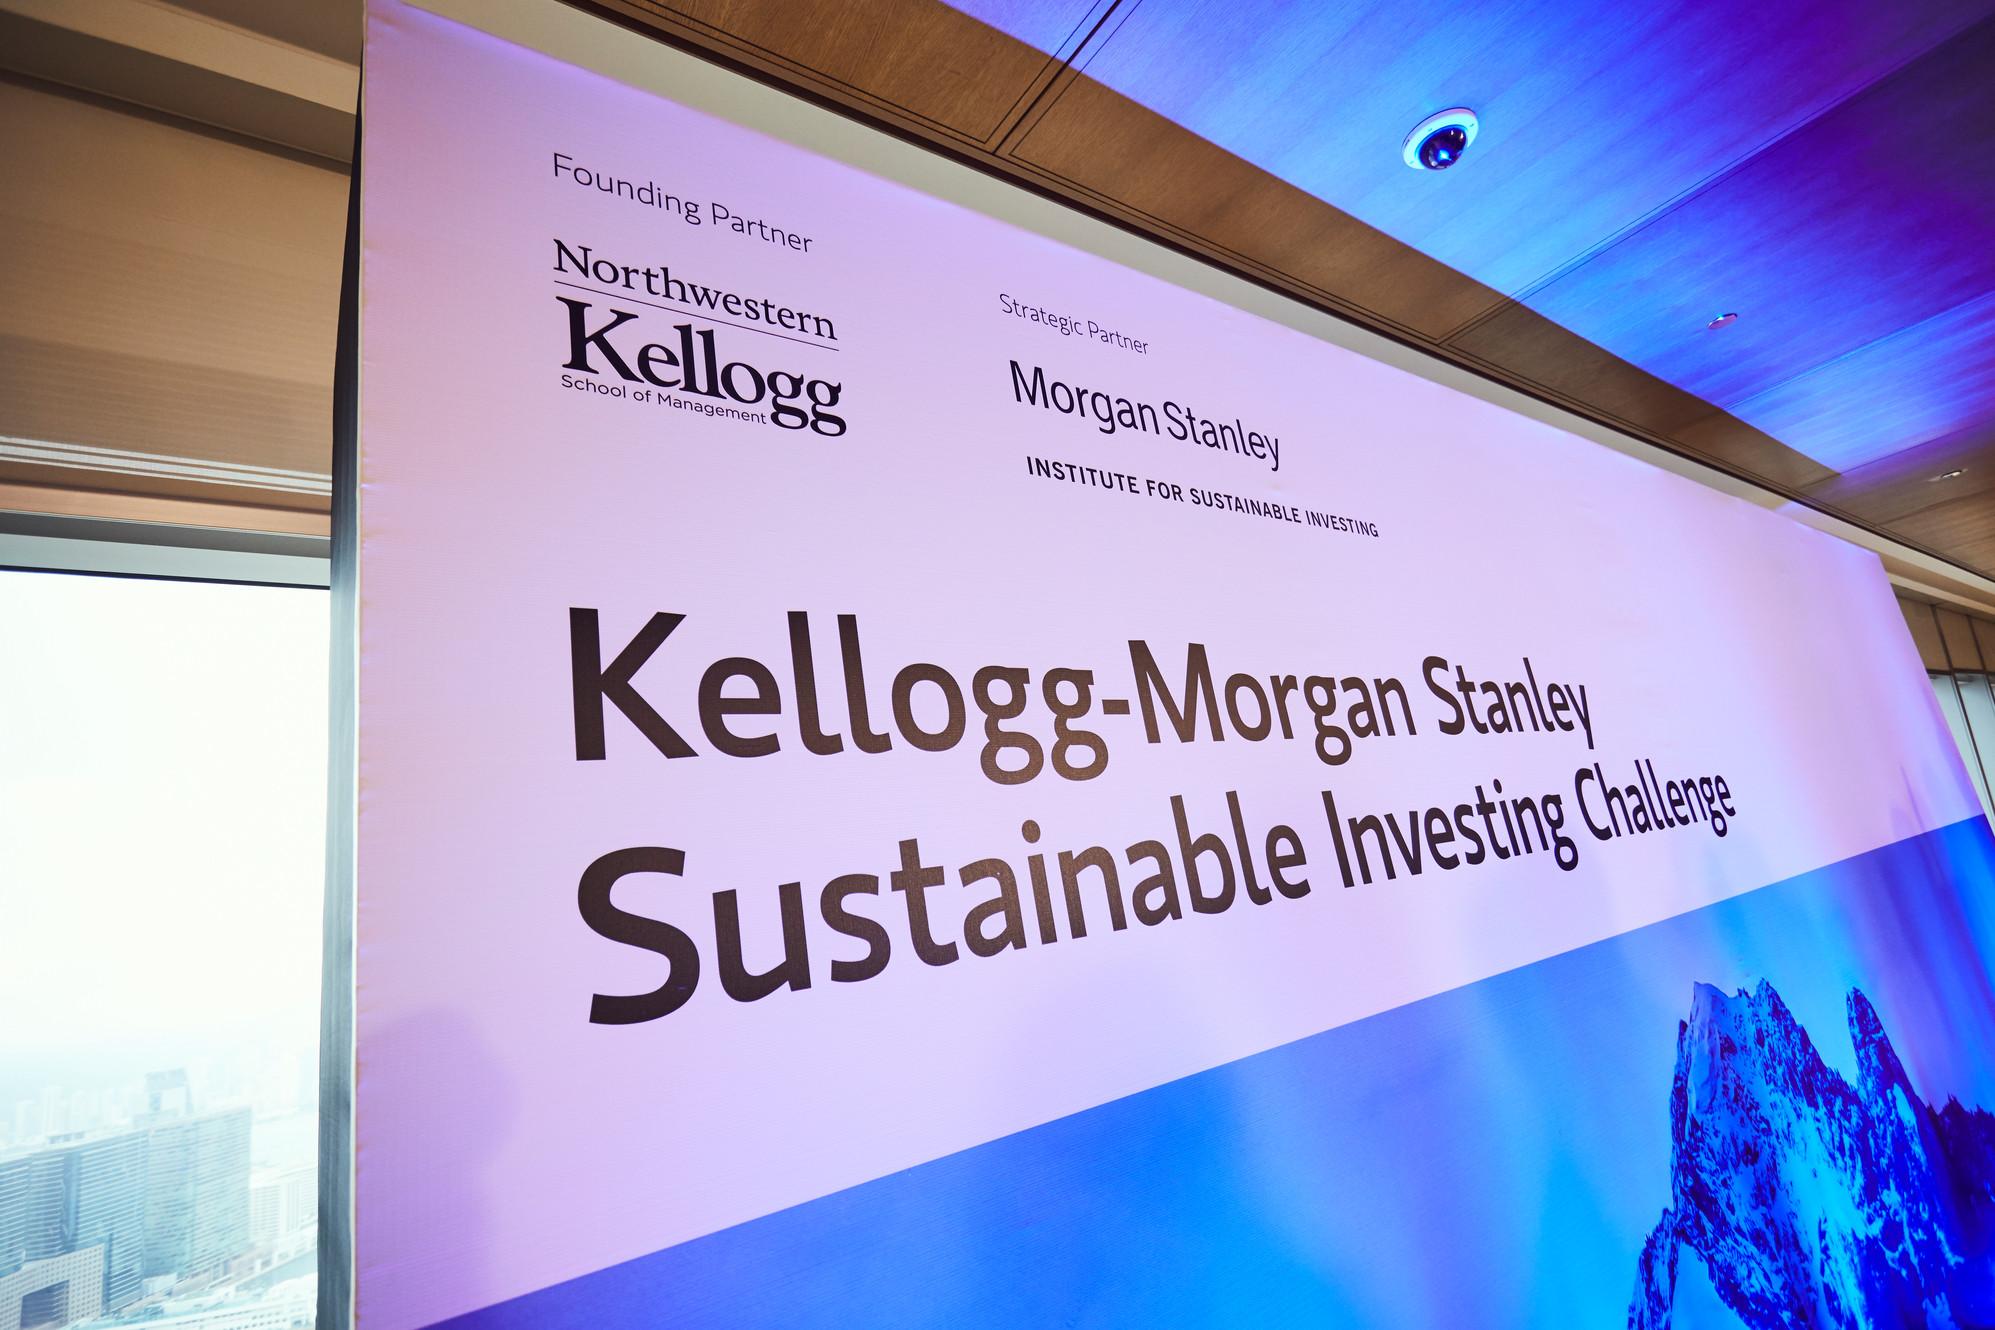 Kellogg Morgan Stanley Sustainable Investing Challenge